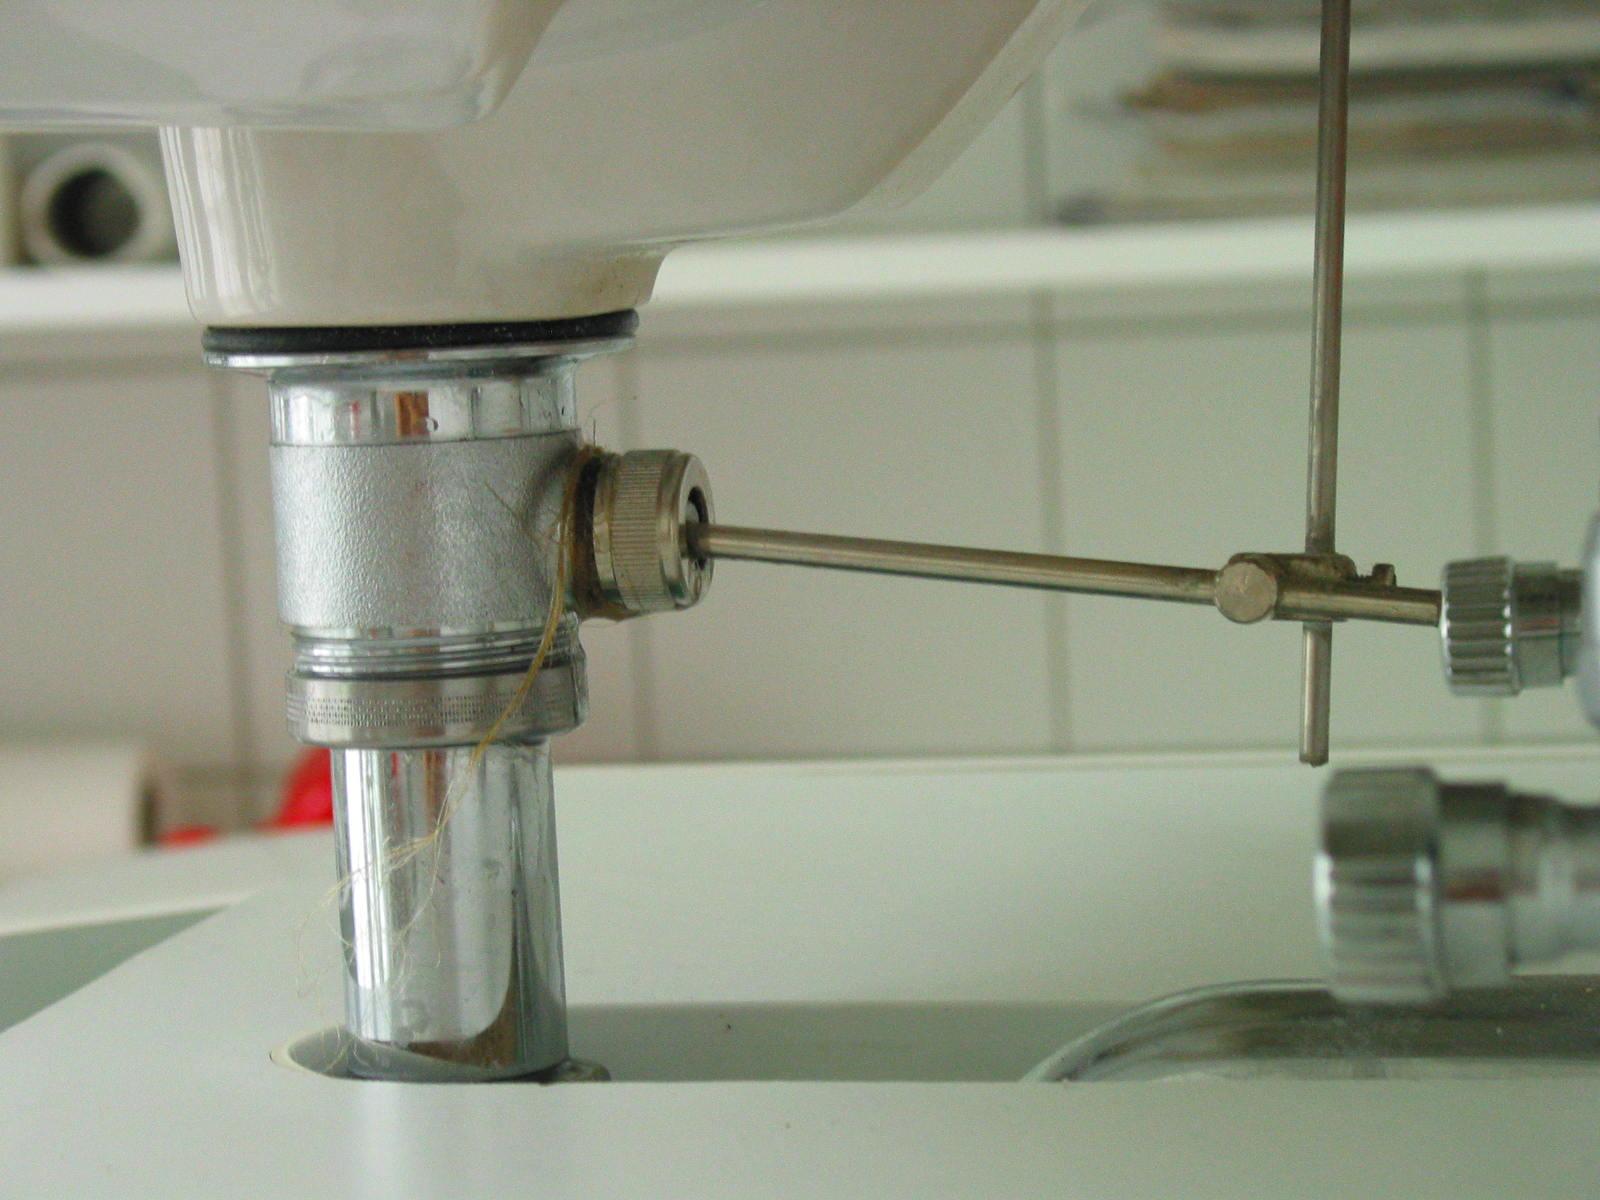 installateur zu teuer ~ Waschbecken Abfluss Undicht